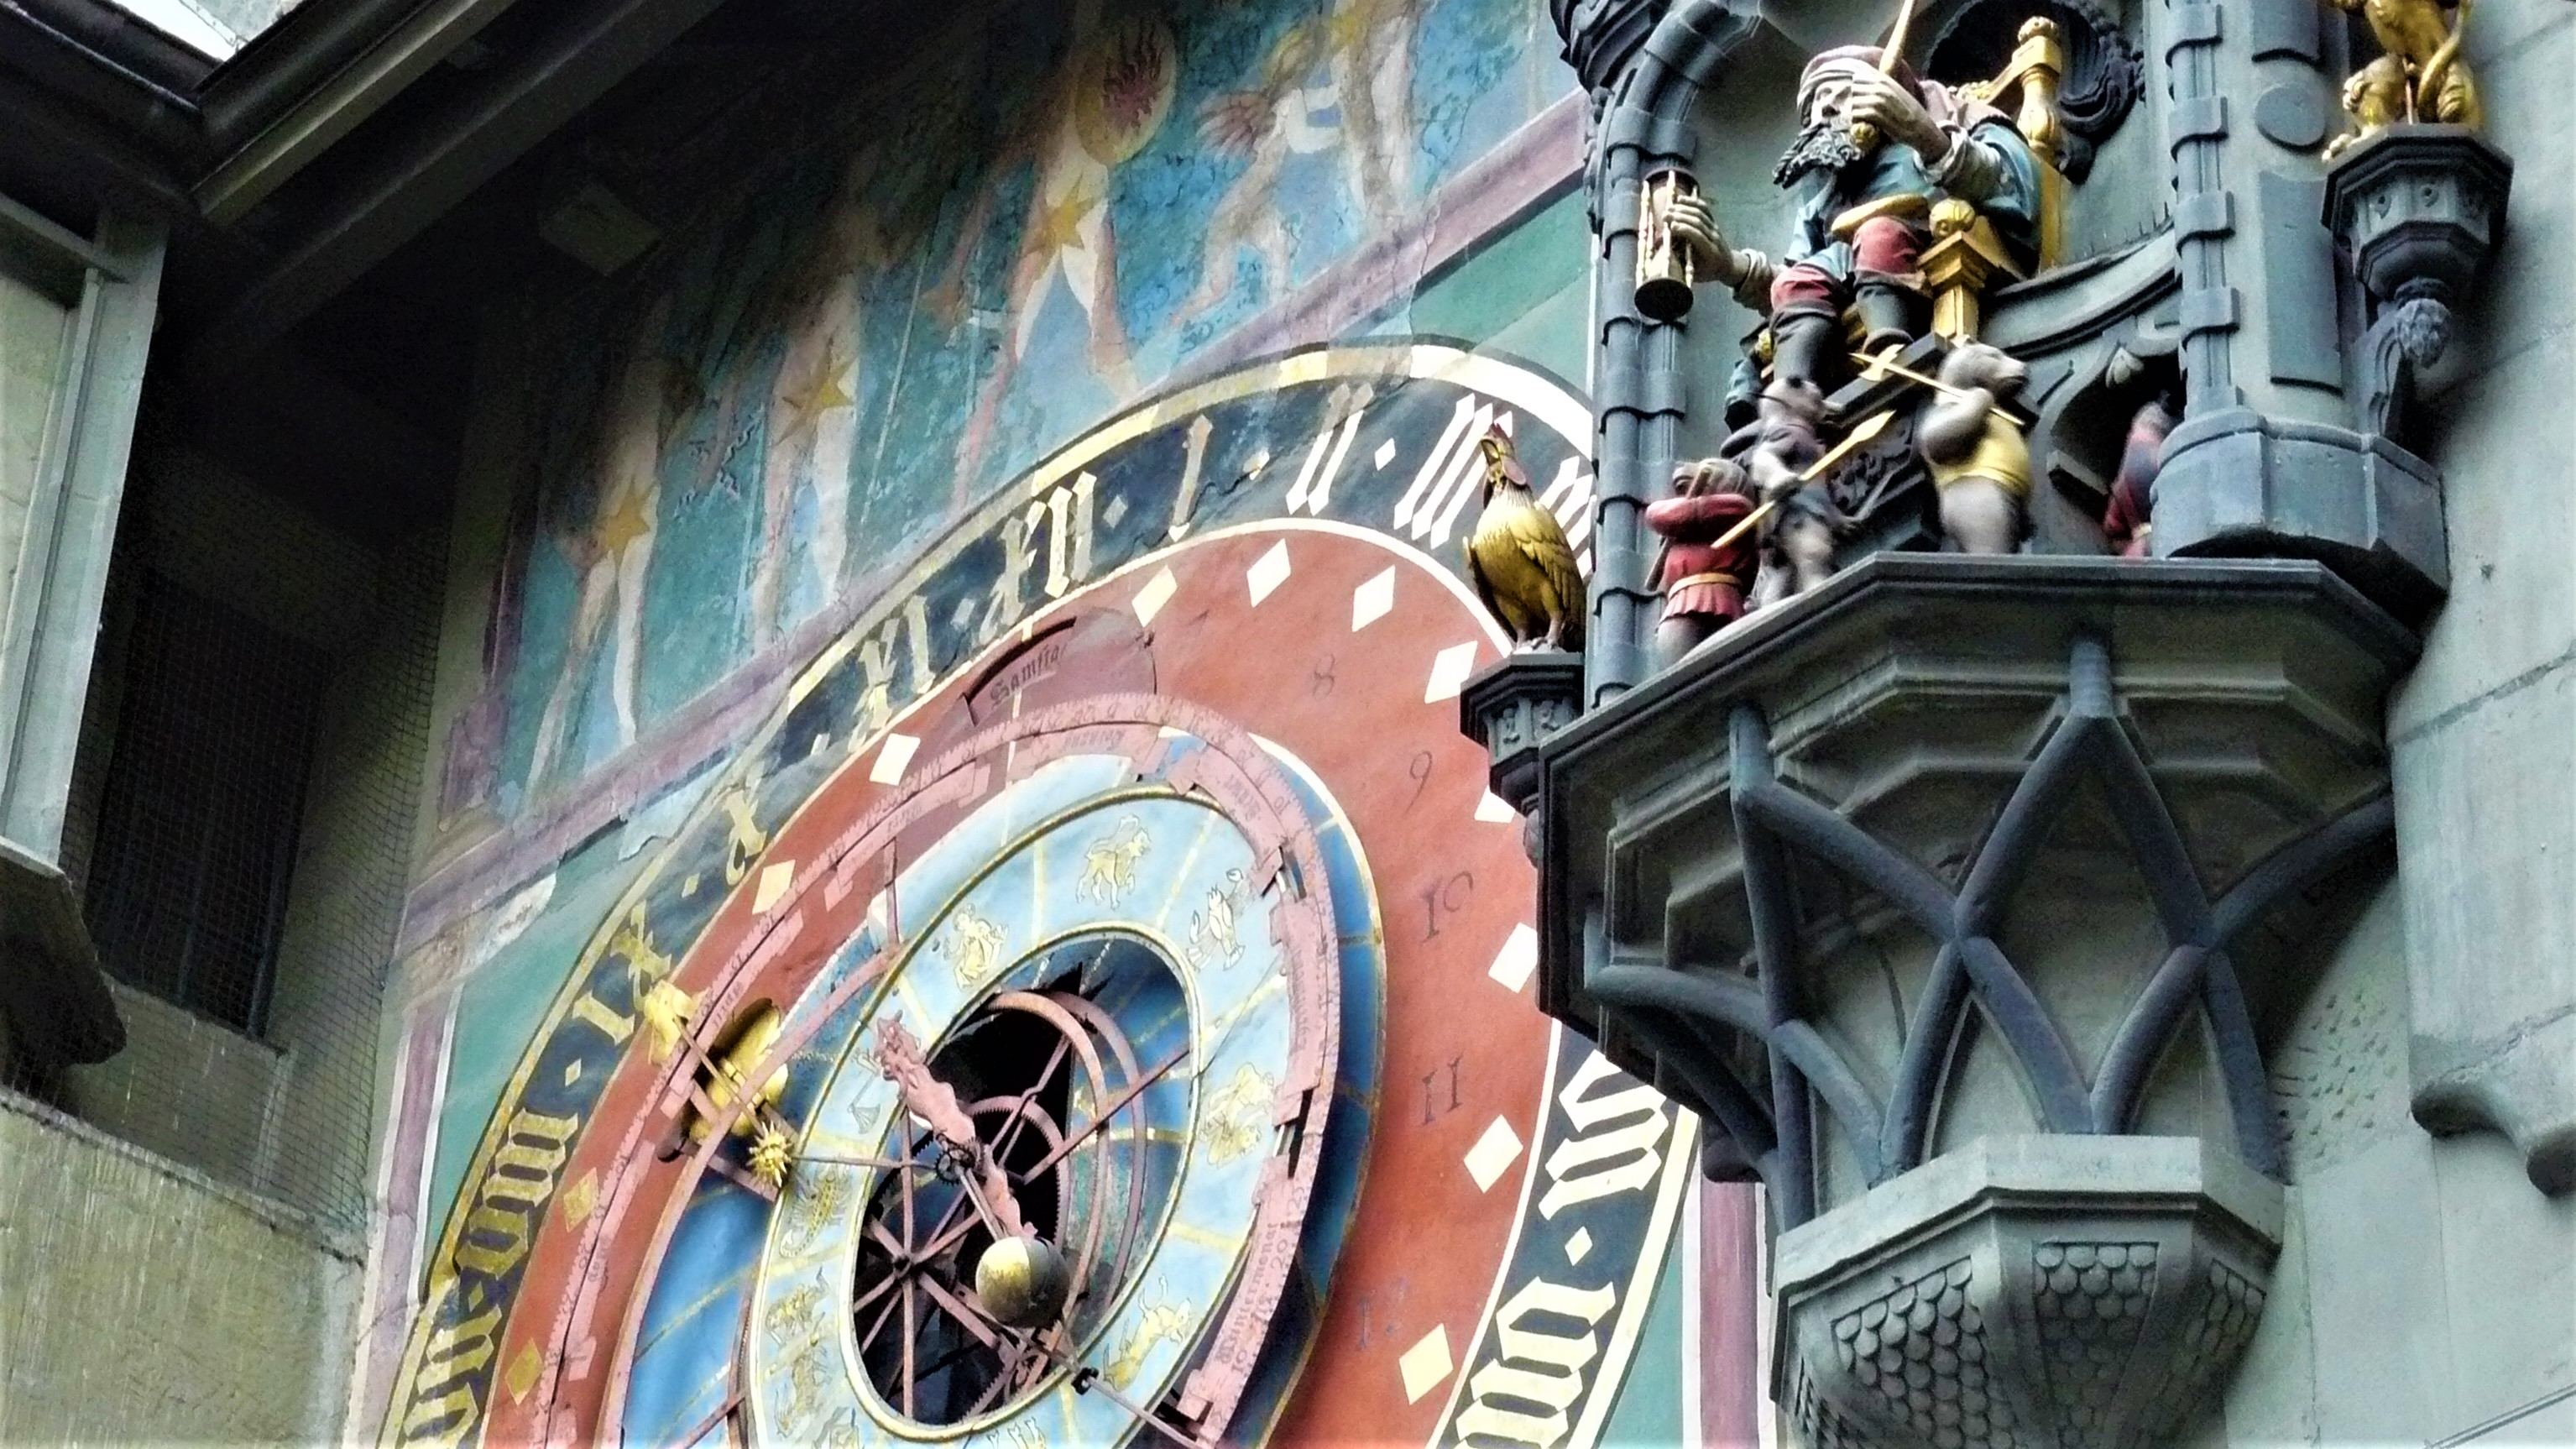 visiter berne horloge vieille ville blog voyage suisse romande arpenter le chemin